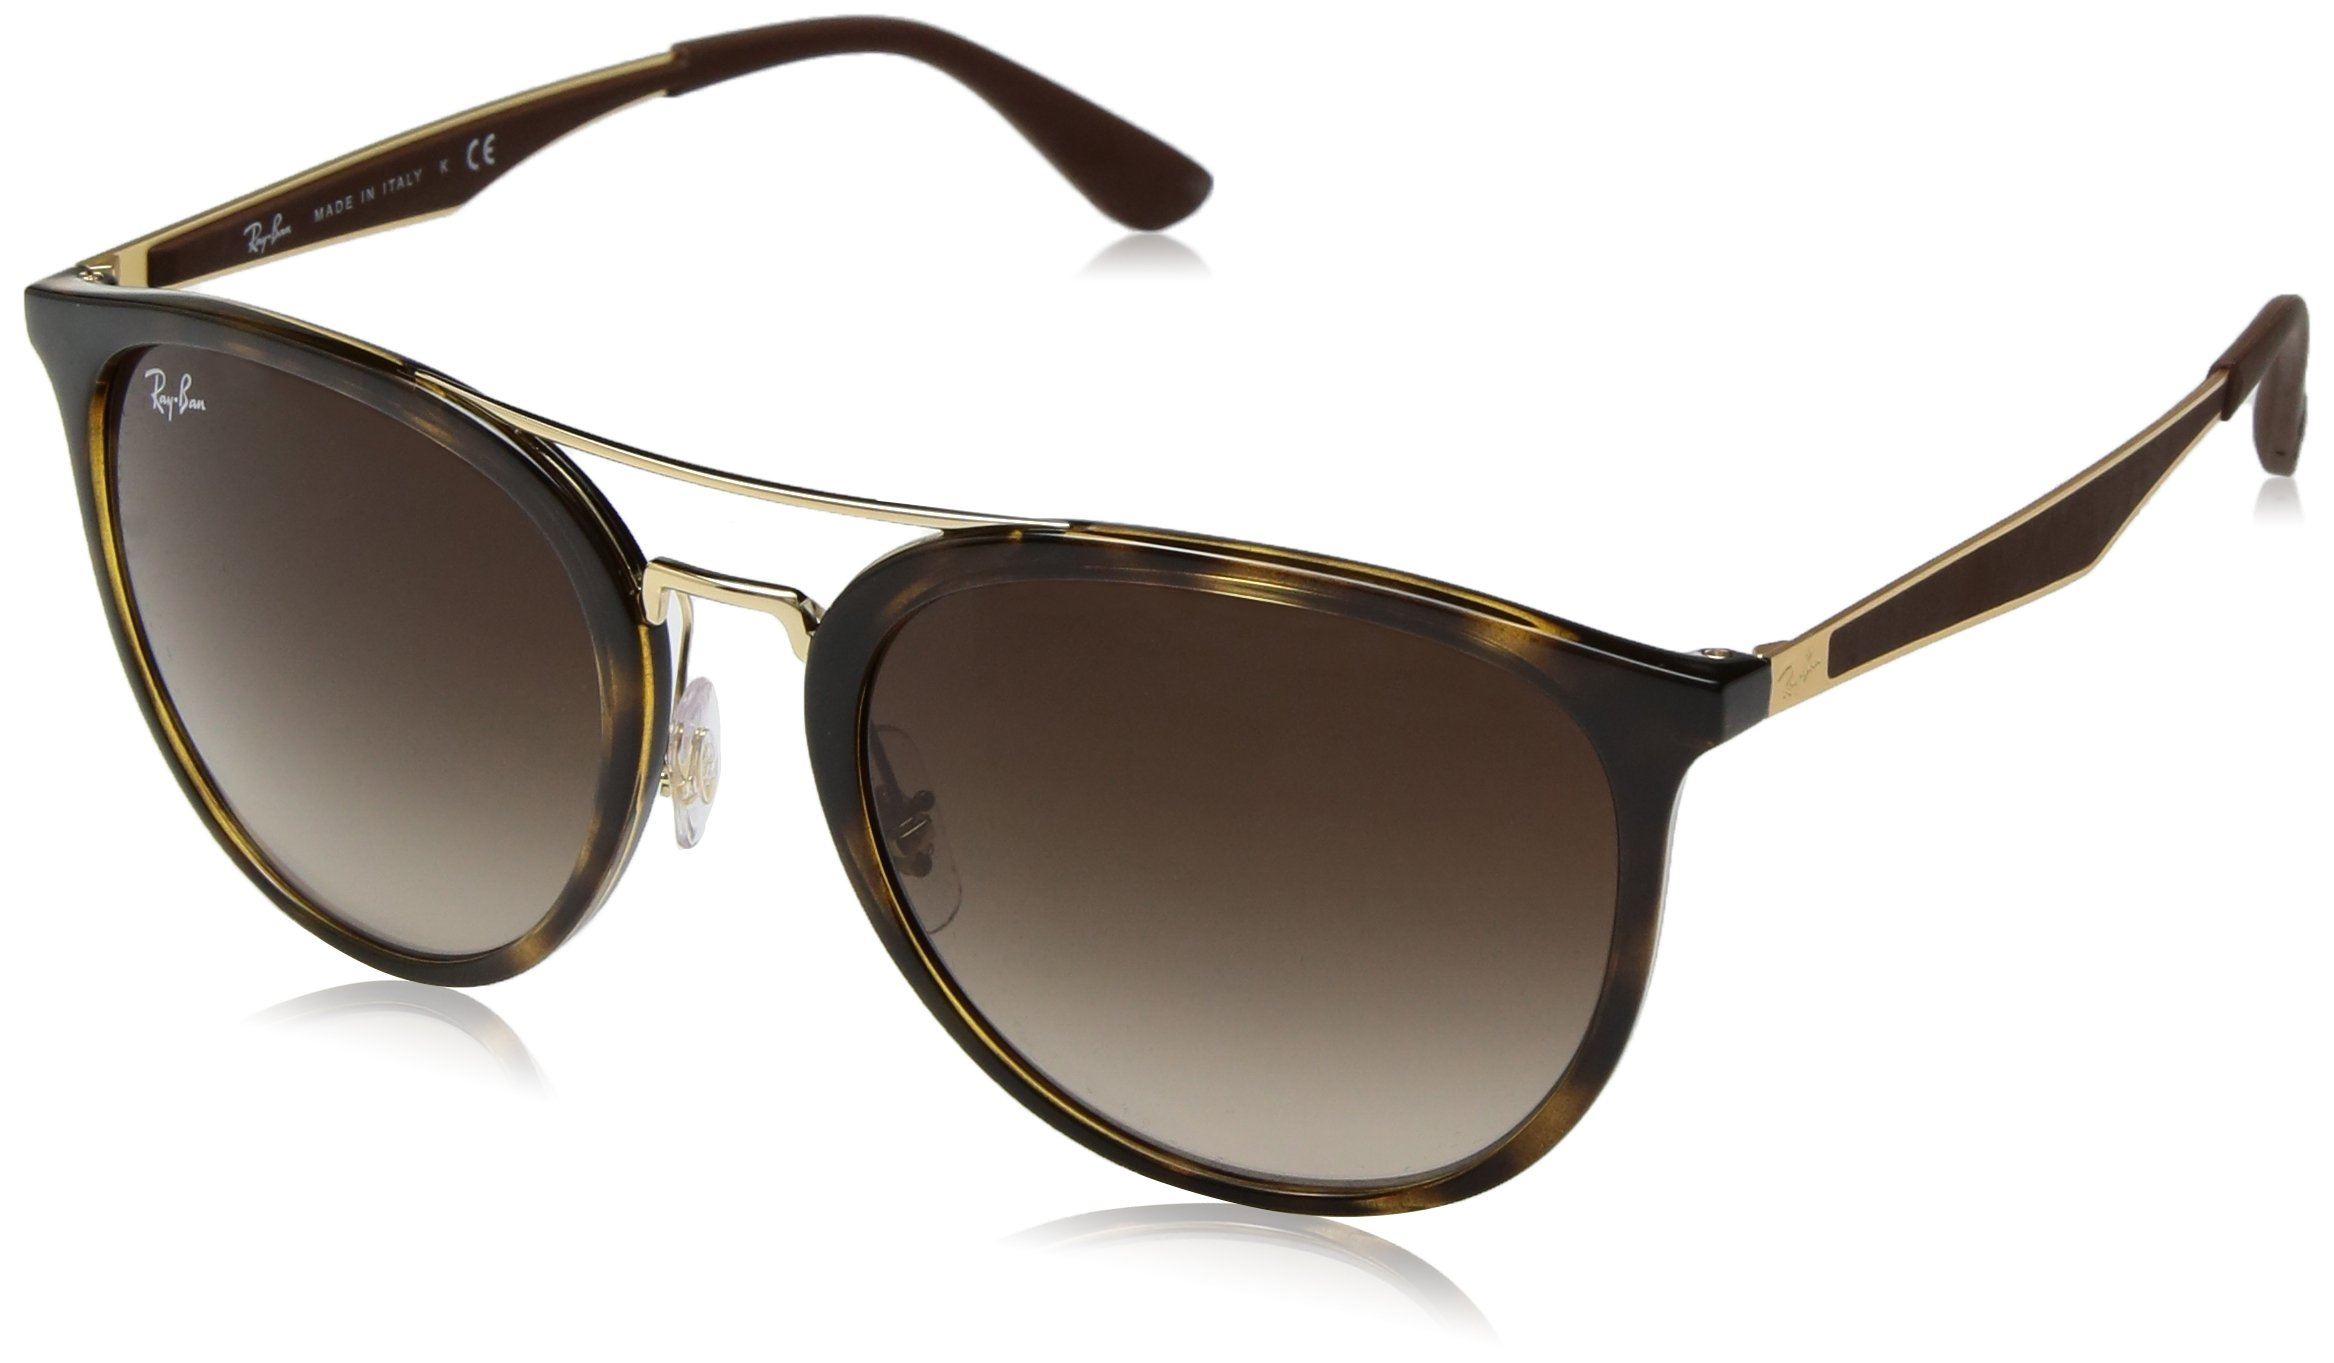 Ray-Ban Men's Plastic Man Square Sunglasses, Light Havana, 55 mm